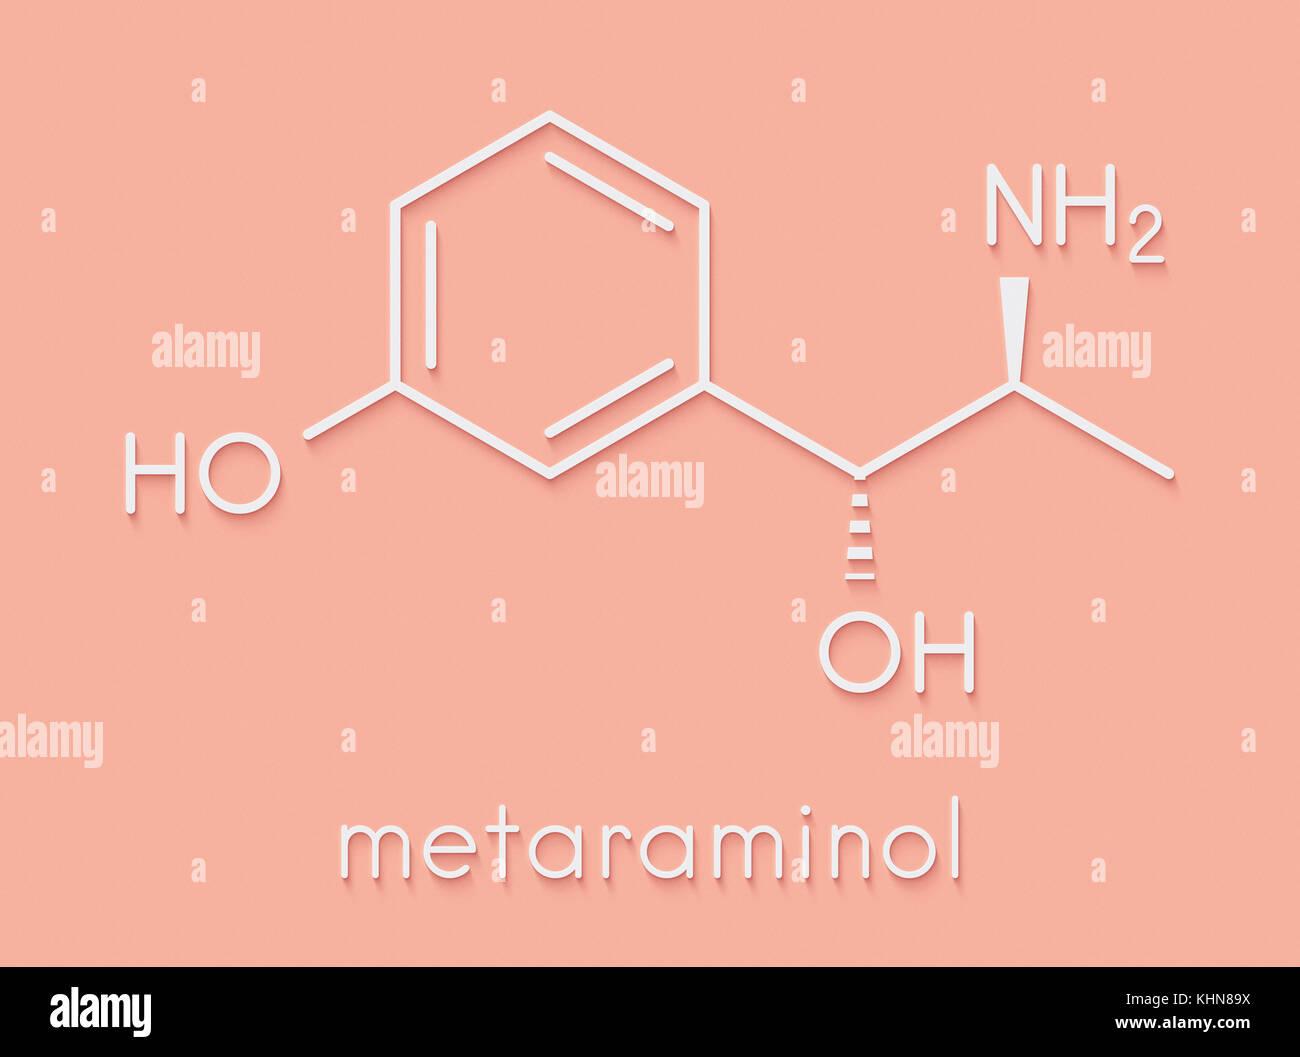 Metaraminol (metaradrine) hypotension drug molecule. Used in treatment of low blood pressure, e.g. due to anesthesia. - Stock Image